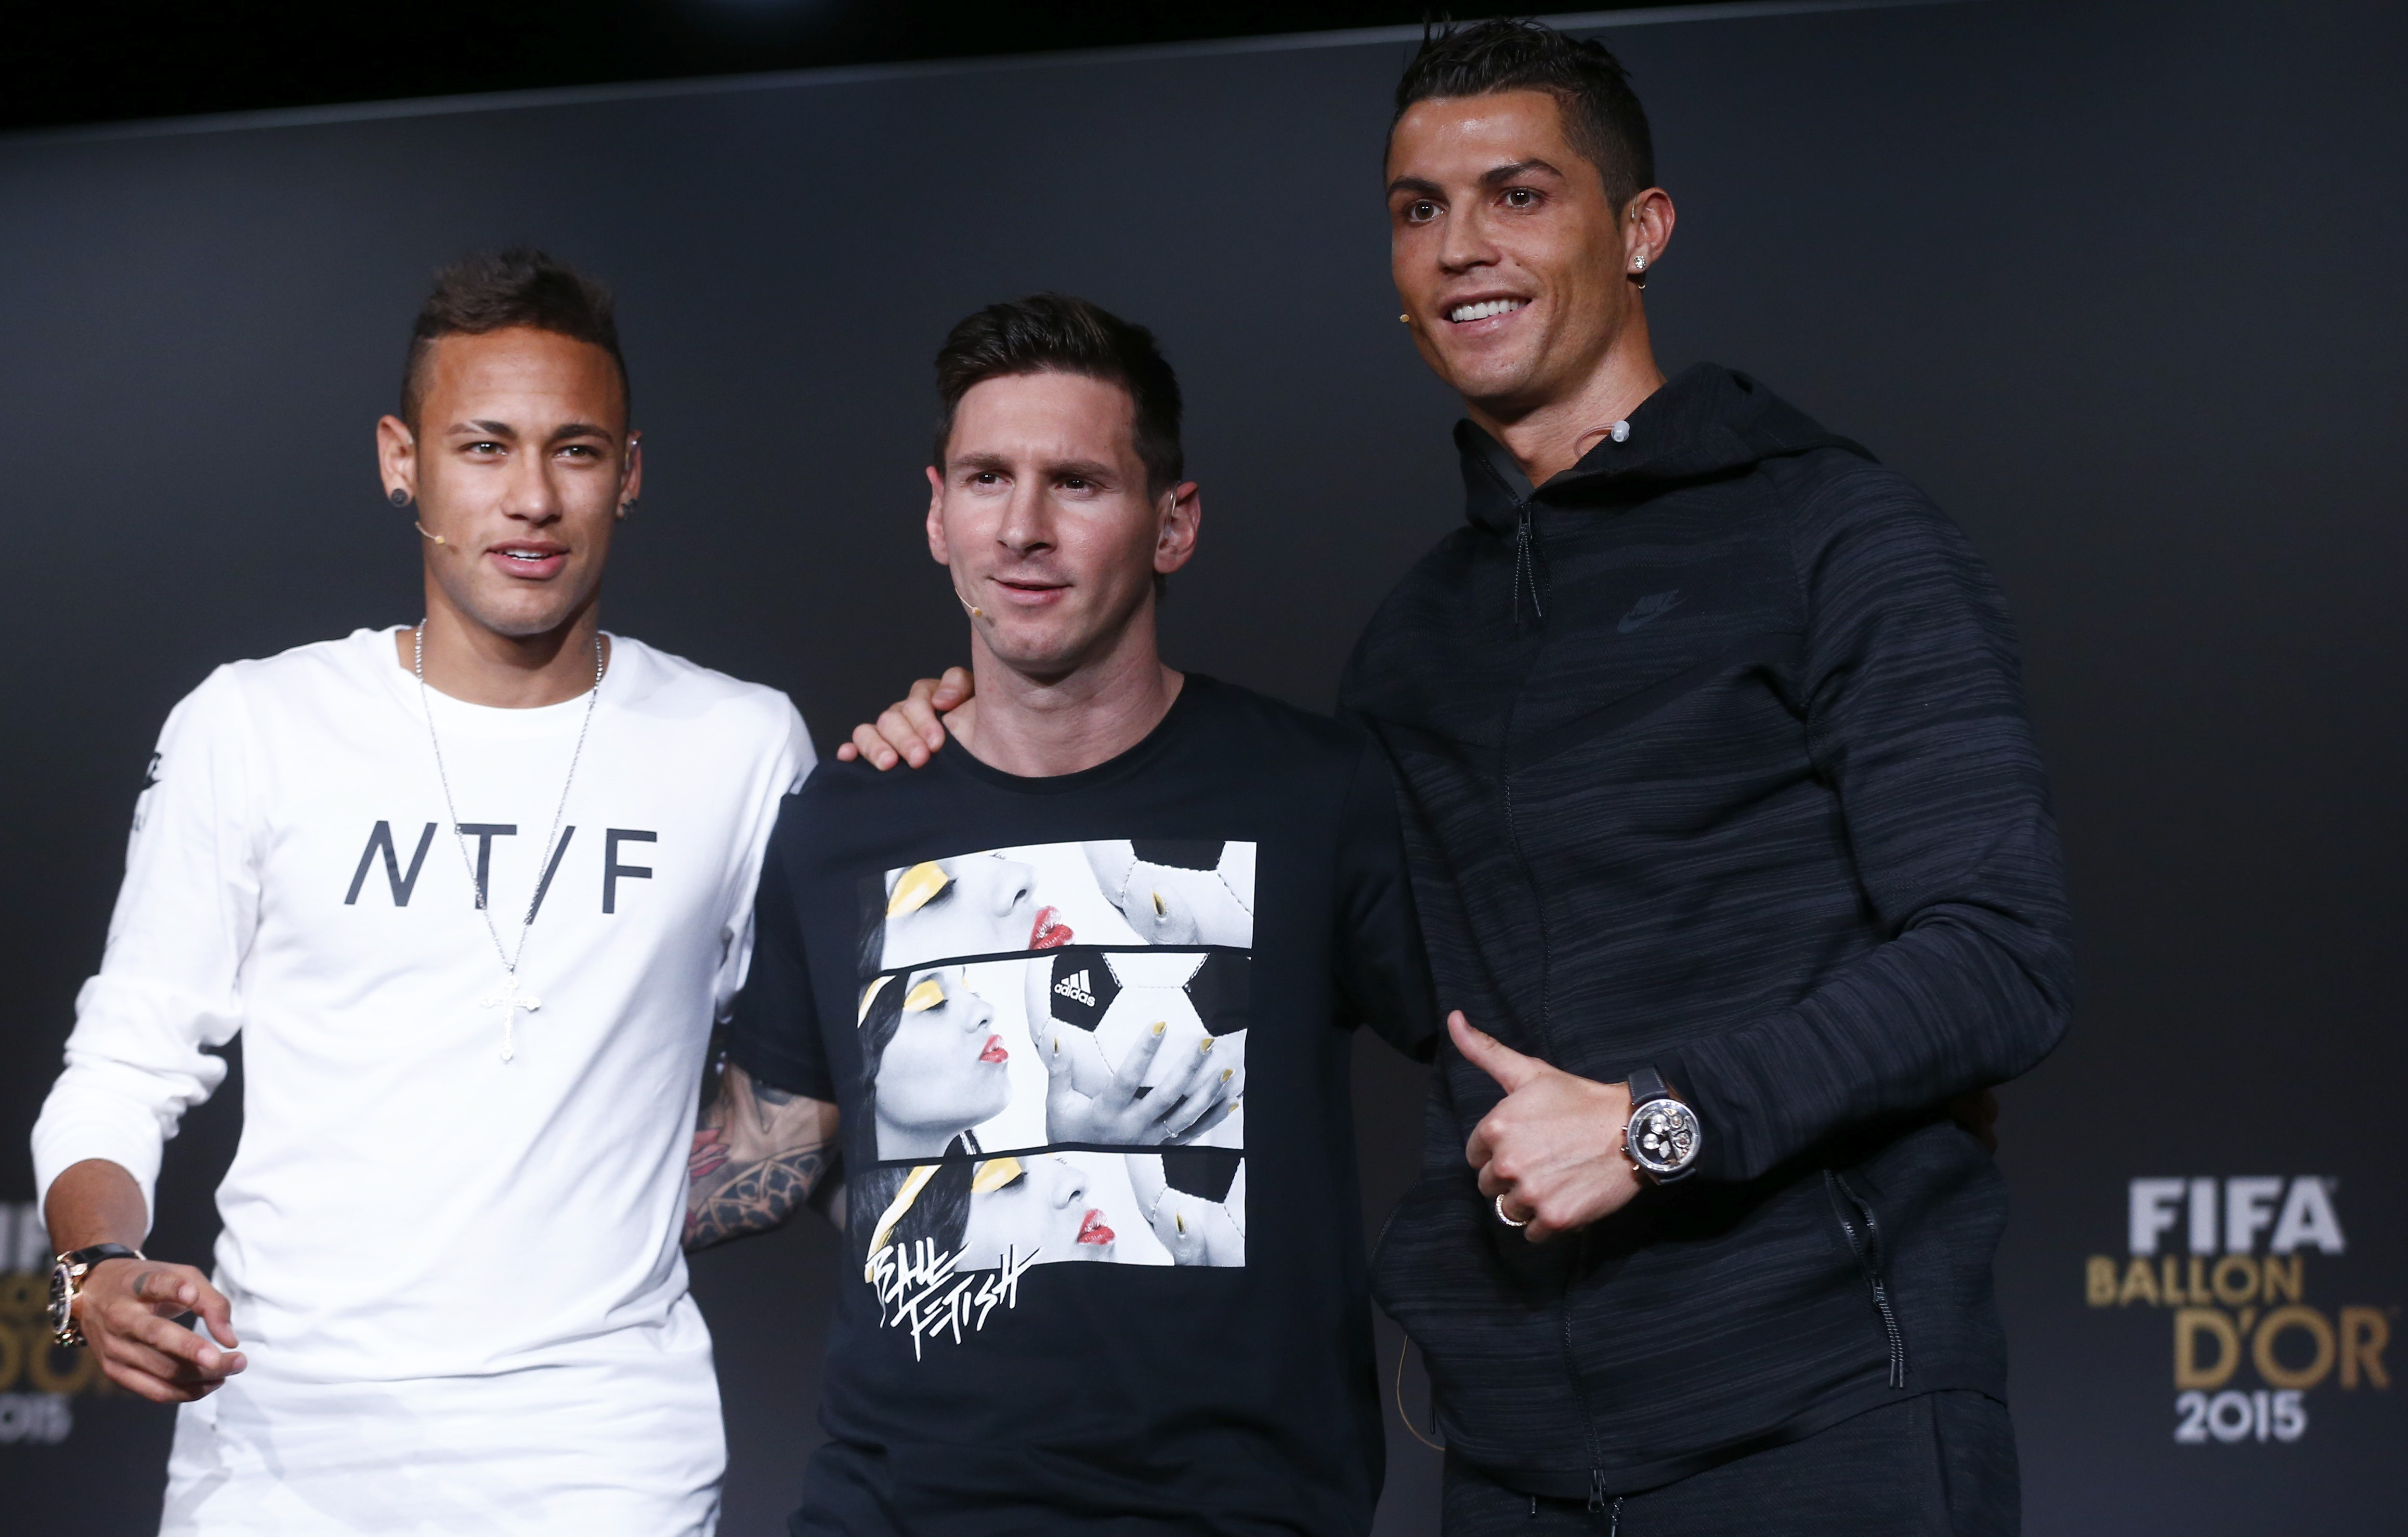 Neymar, Lionel Messi and Cristiano Ronaldo at the Ballon d'Or press conference